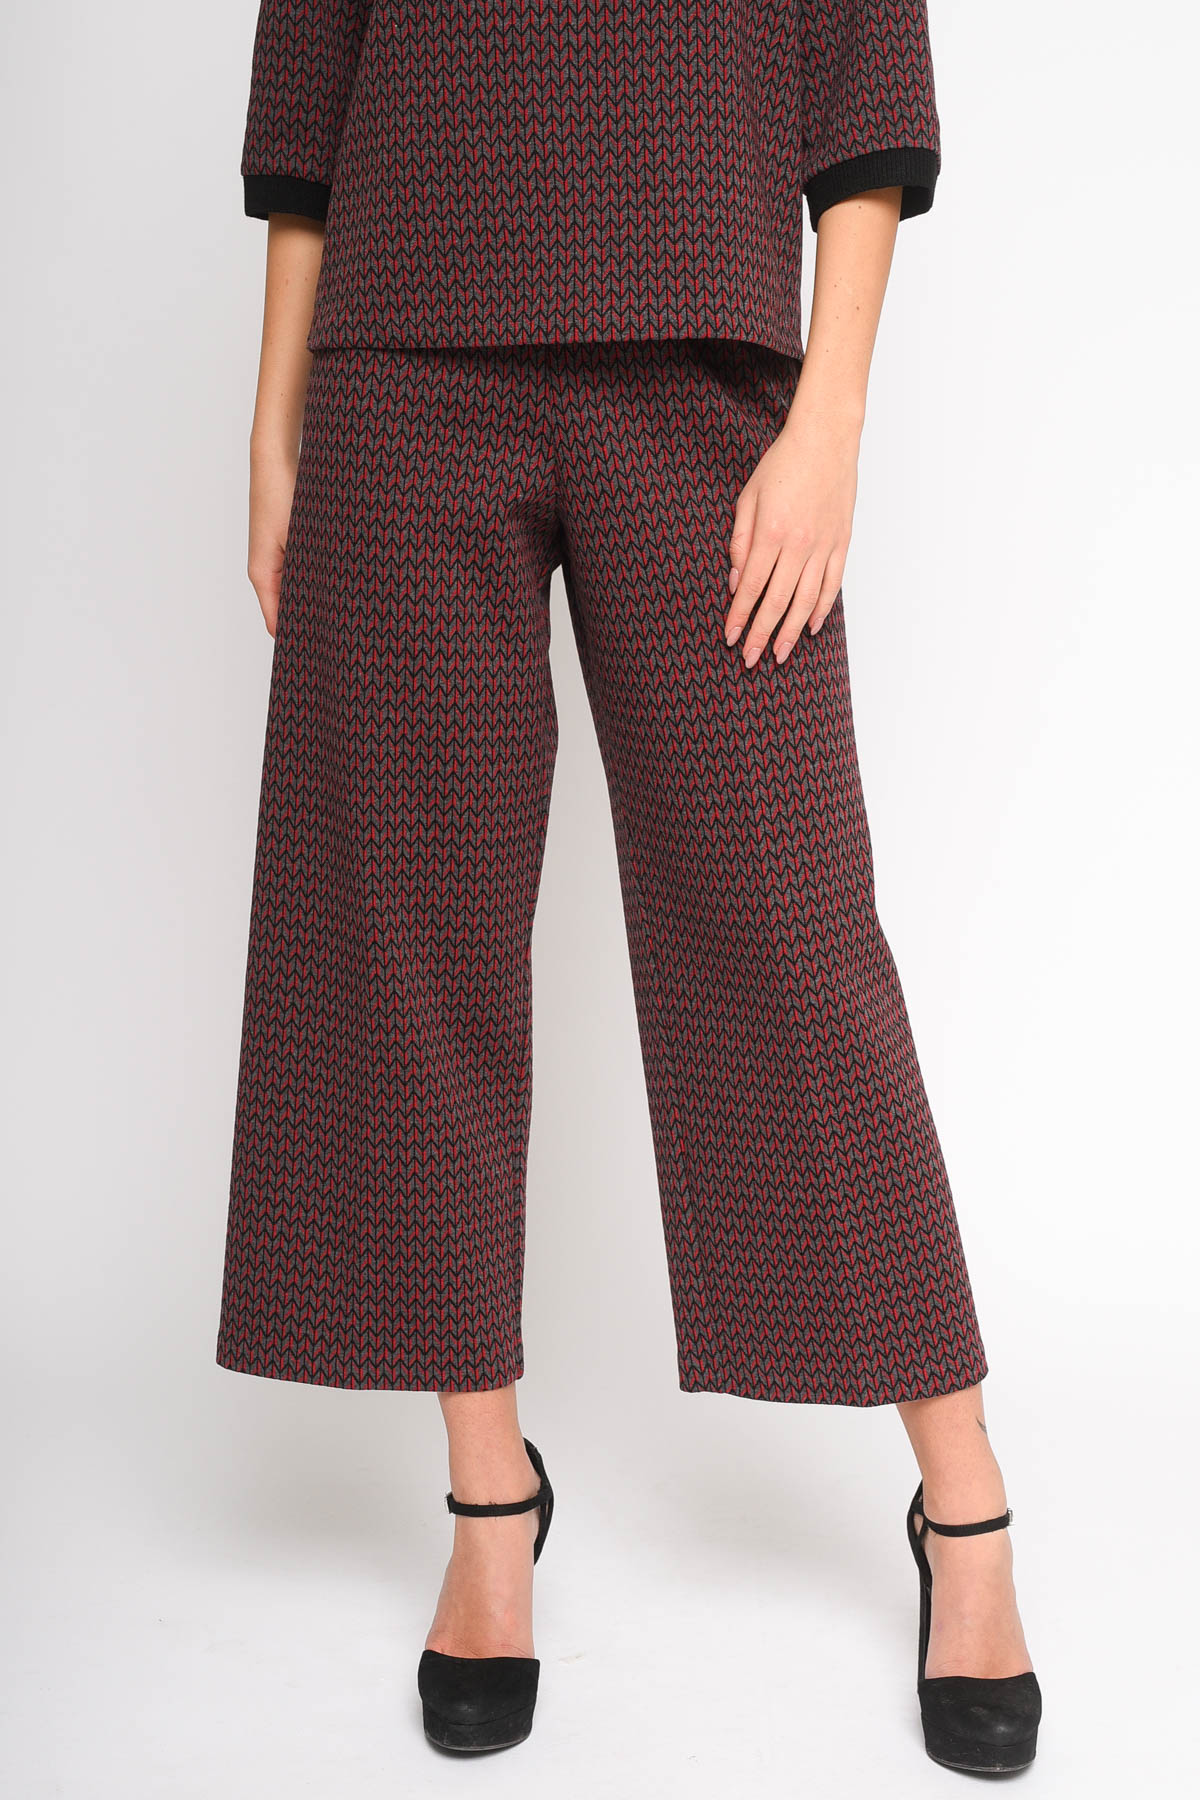 PANTALONE GAUCHO A FANTASIA  for woman - GREY - Paquito Pronto Moda Shop Online